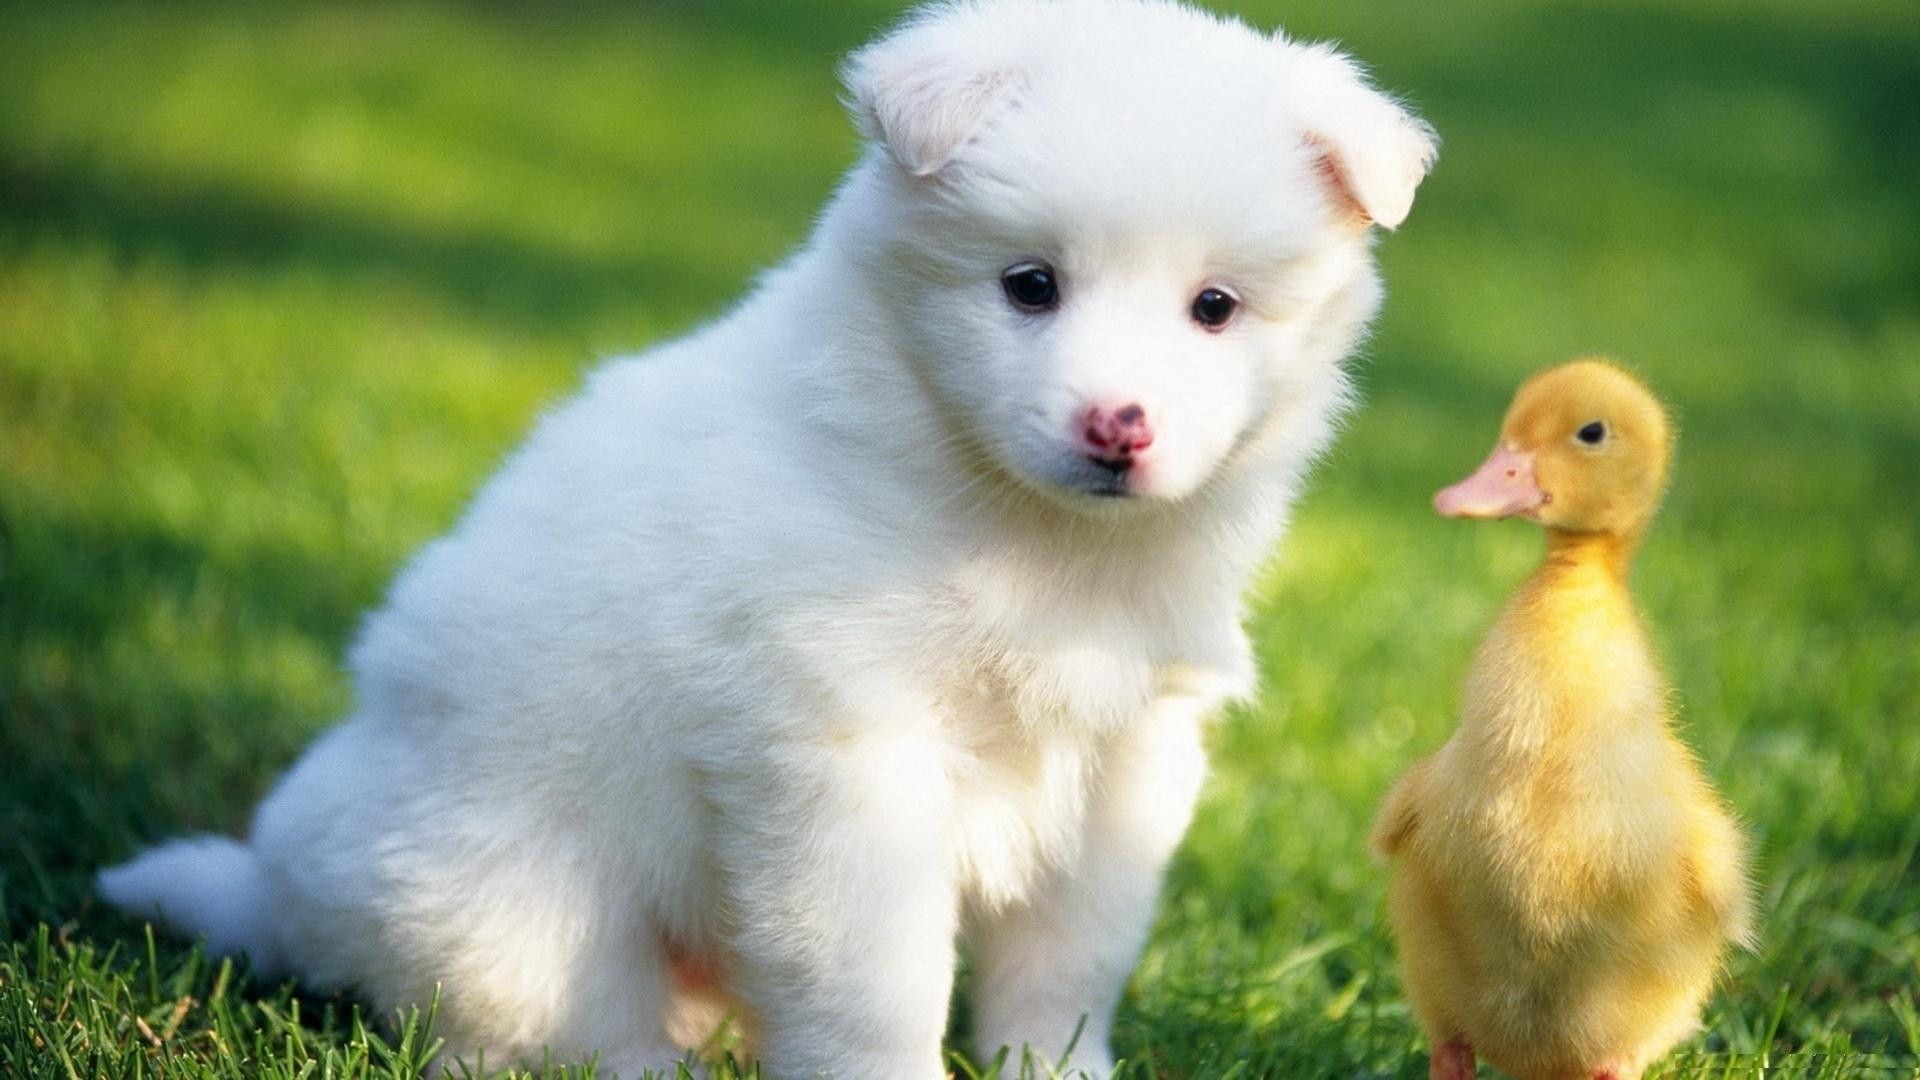 Cute Animal HD Wallpaper